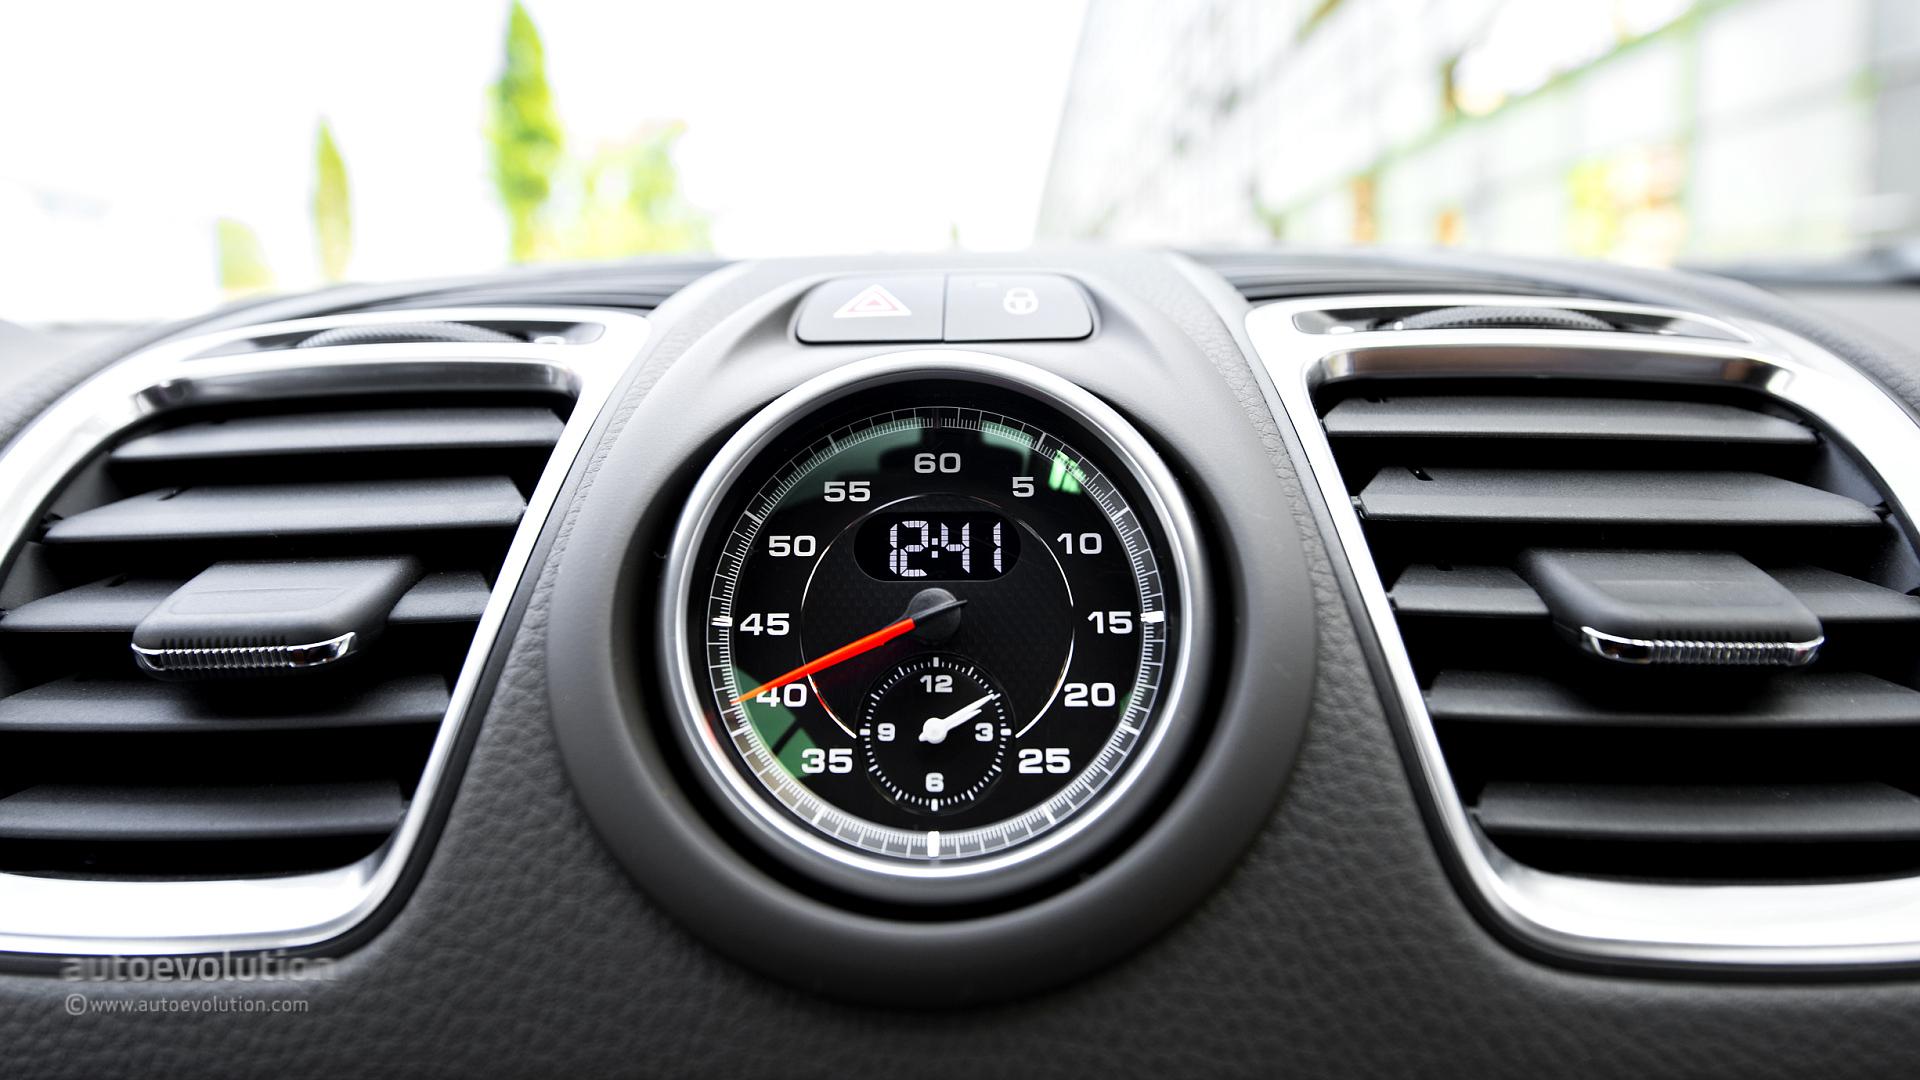 Ford Escape Shudder On Acceleration